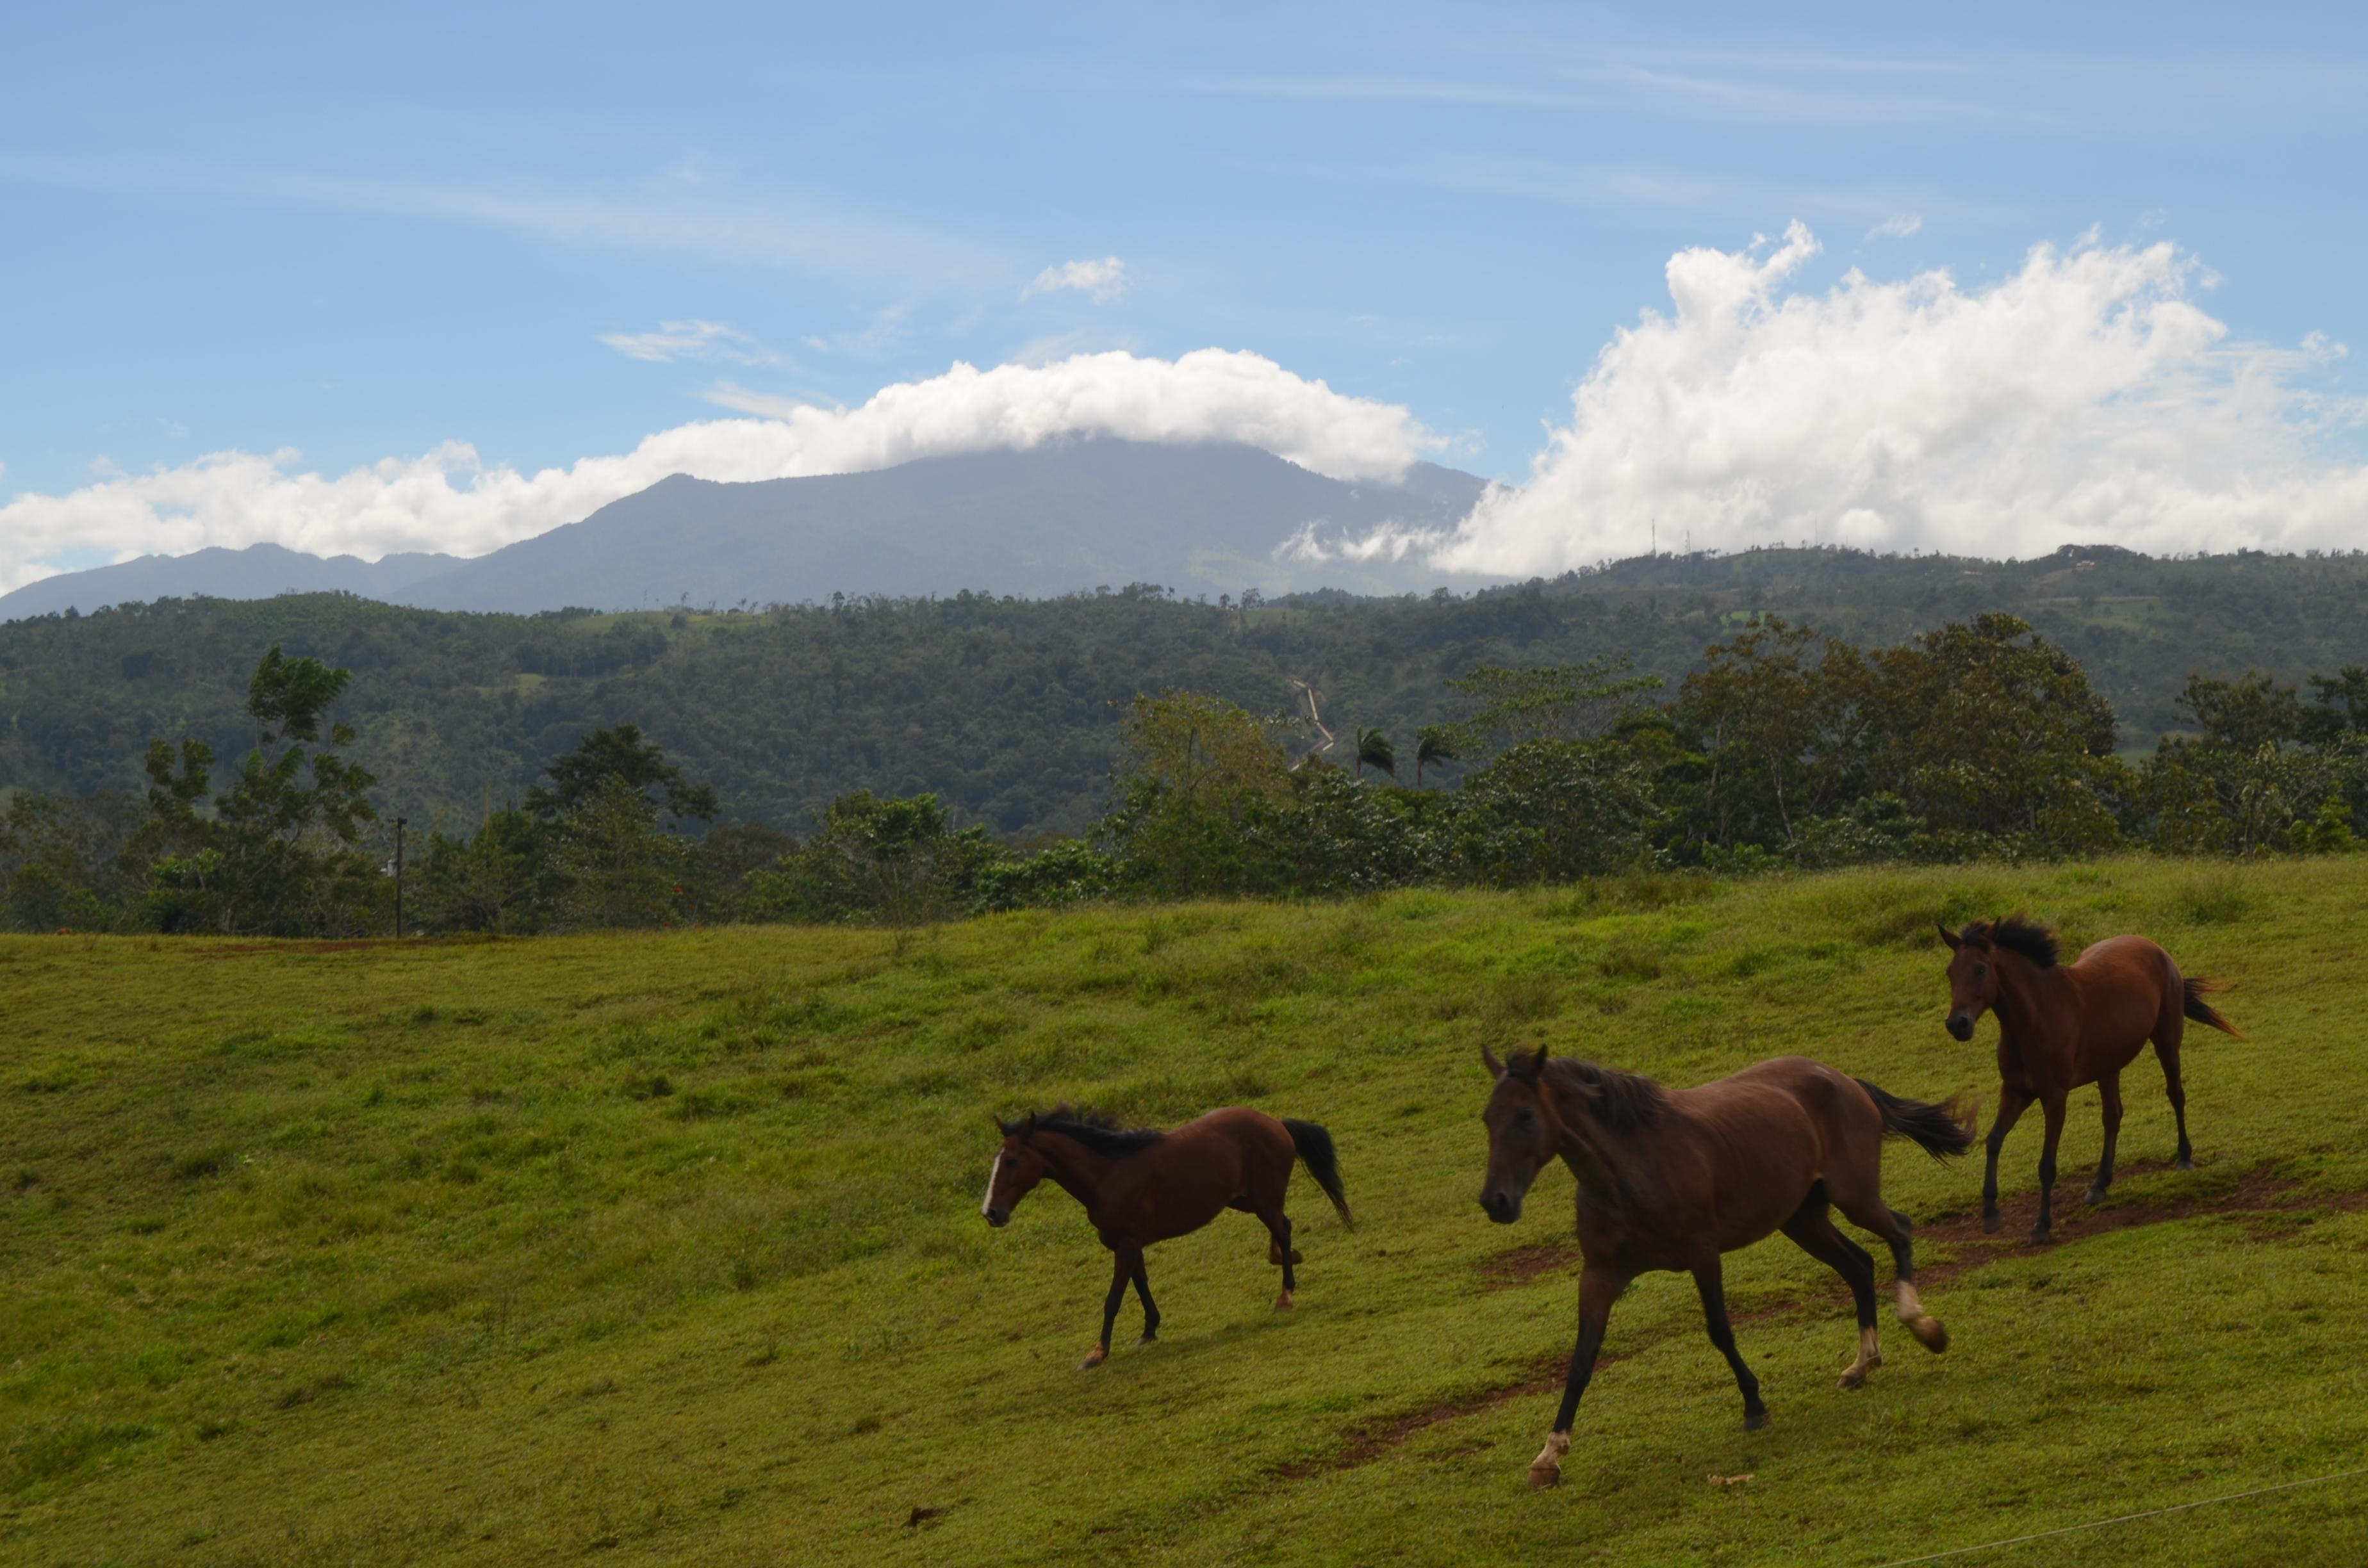 Centaur Costa Rica